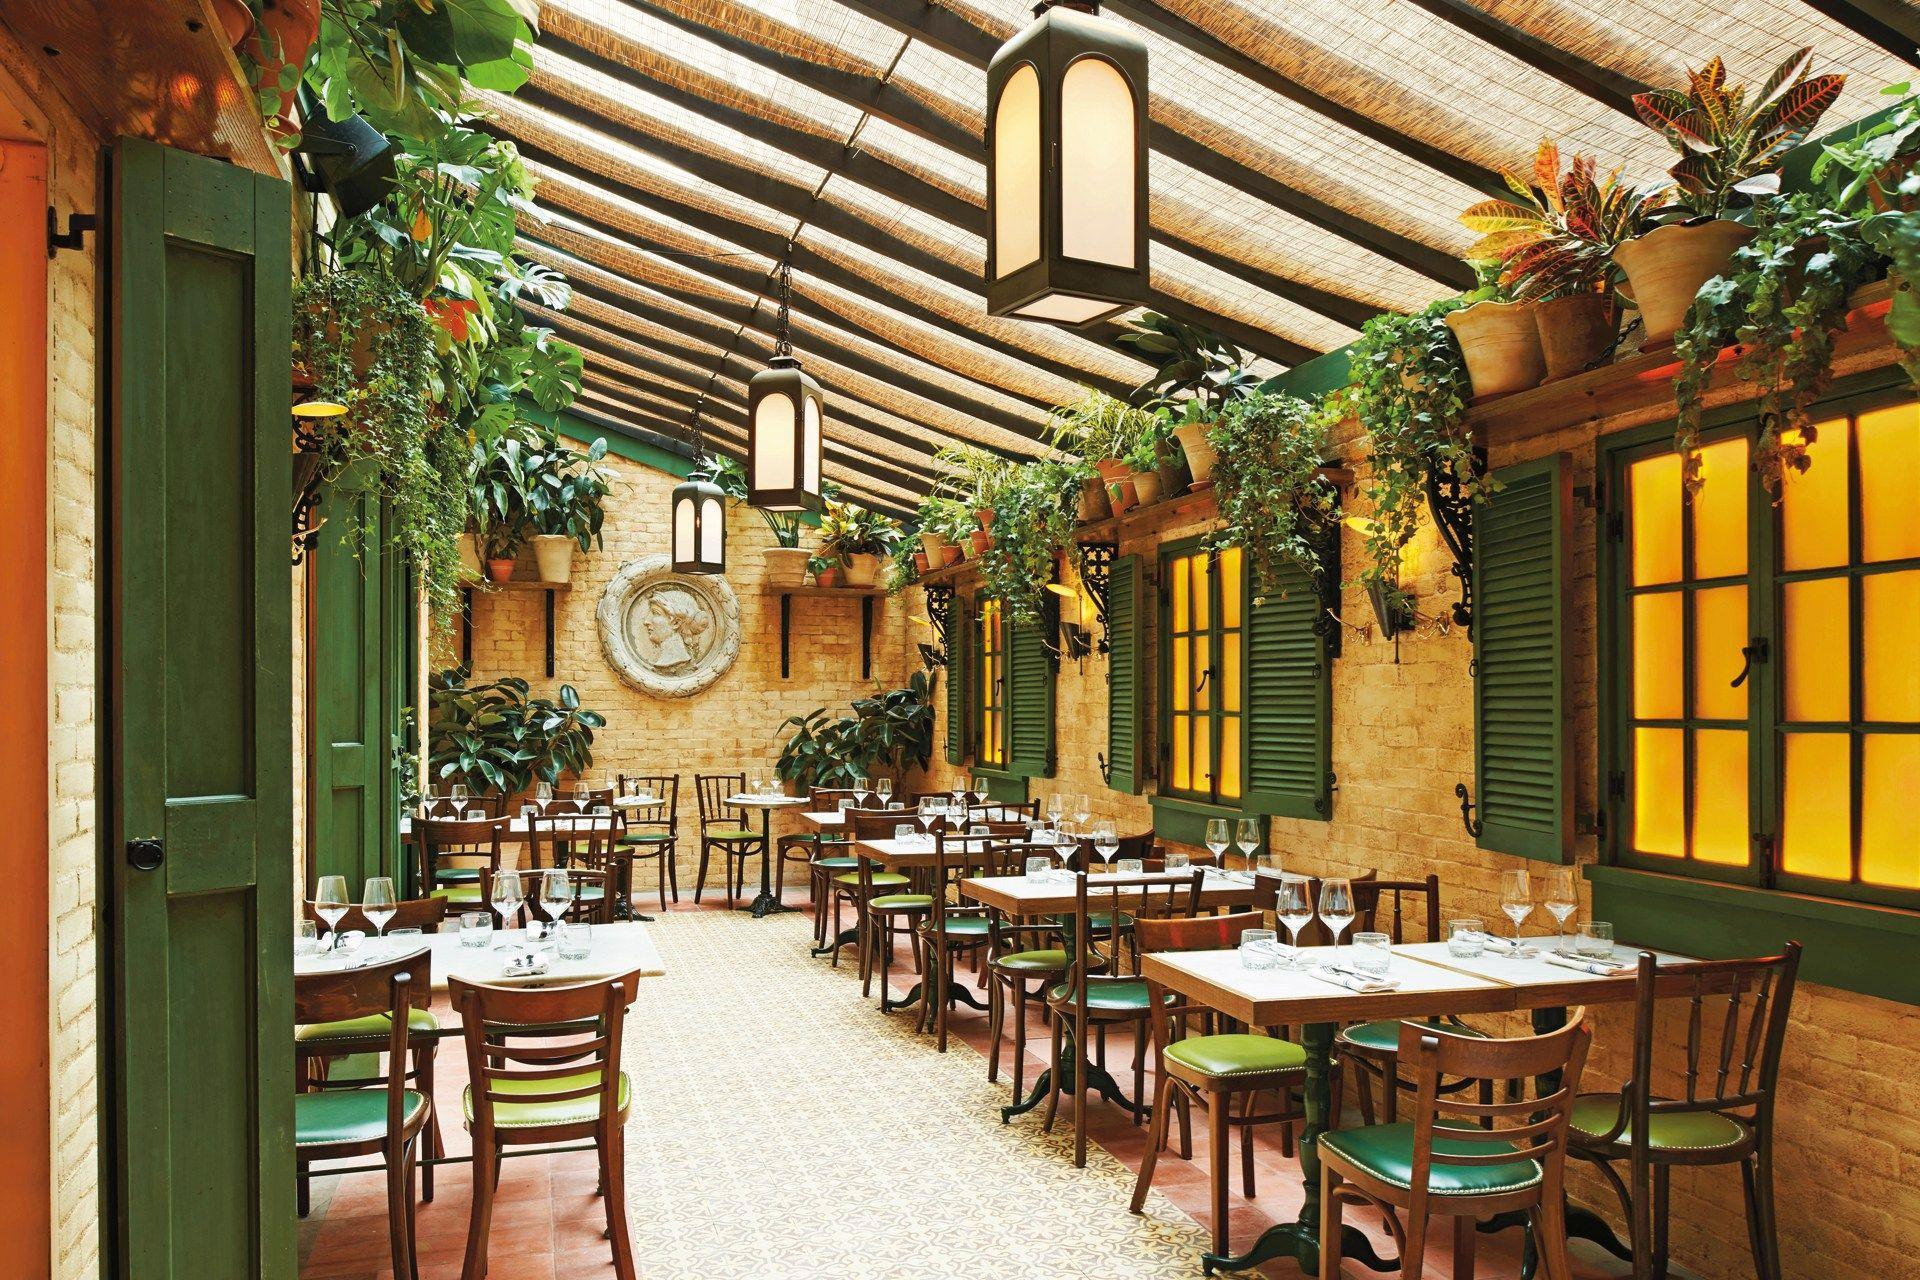 Фото ресторанов в европе и америке